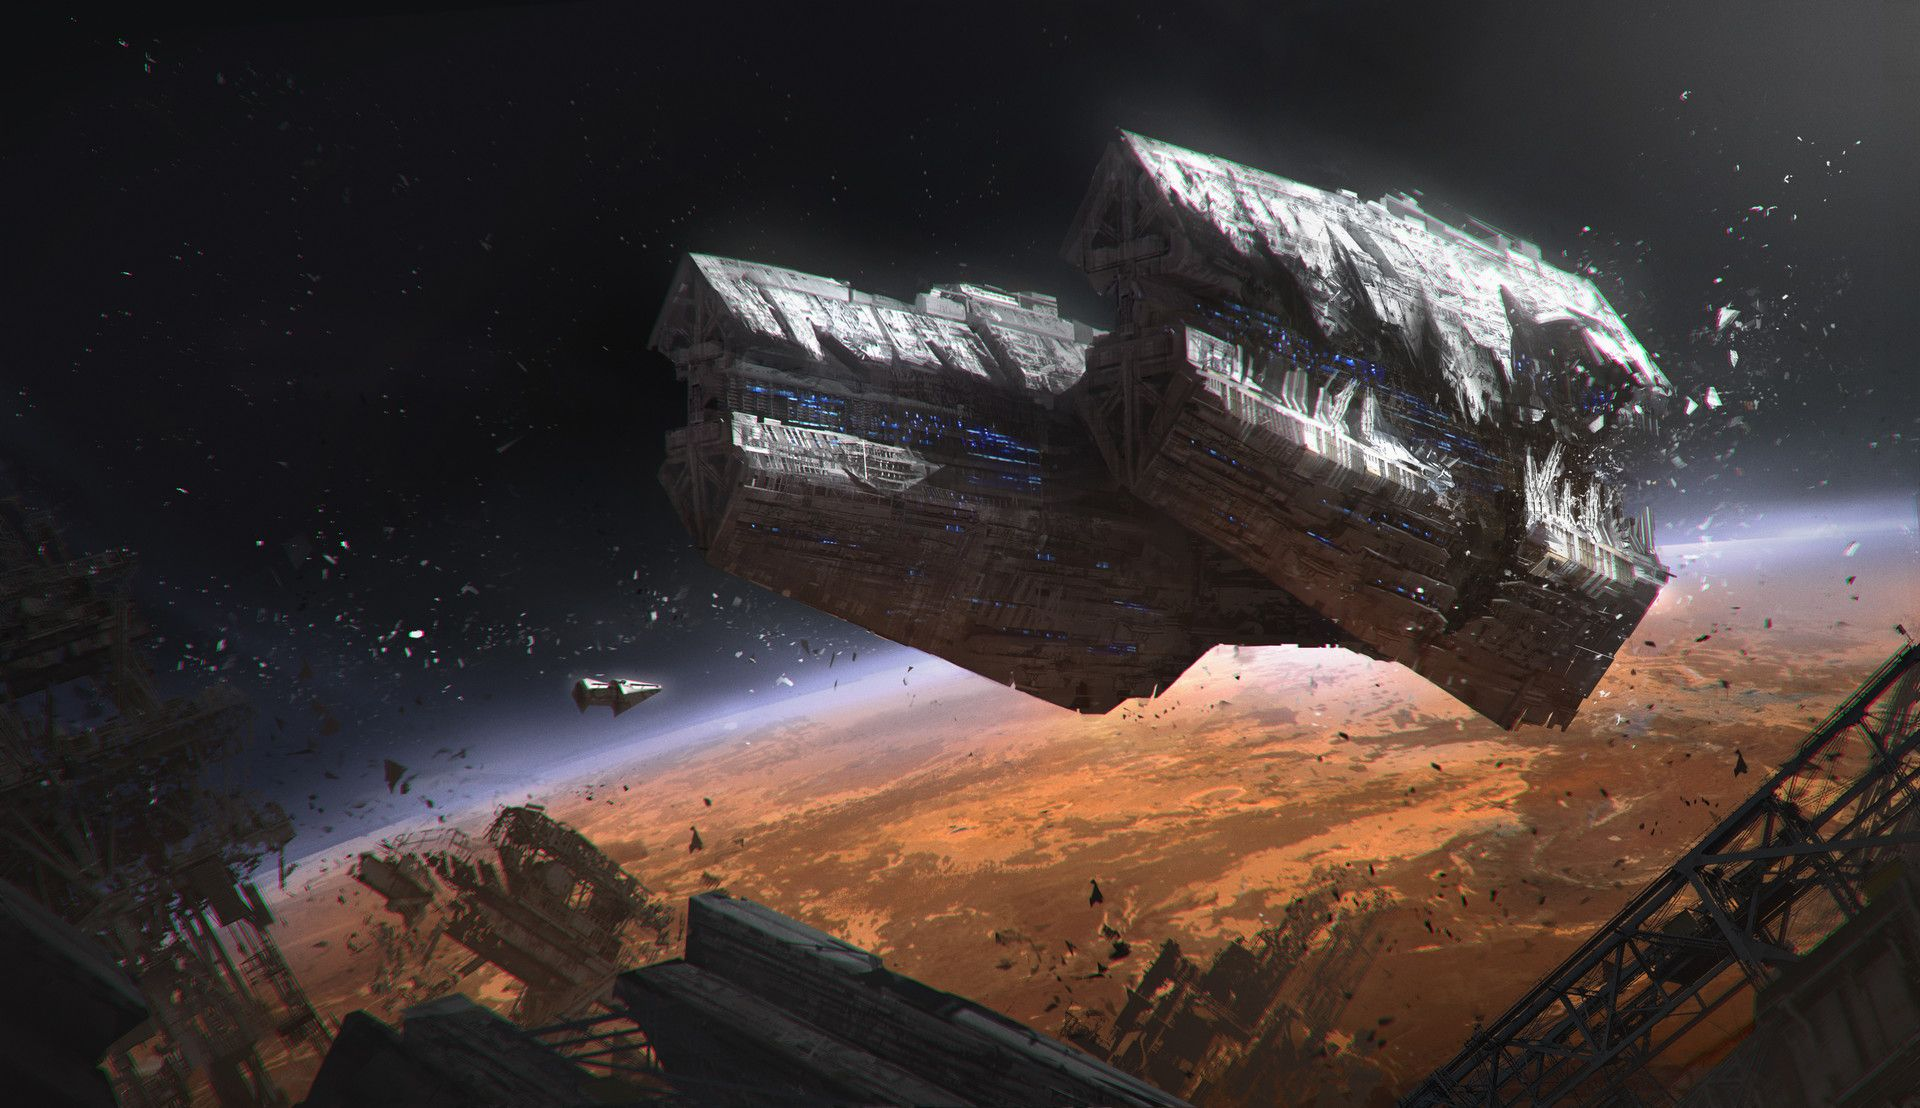 Image result for derelict spaceship